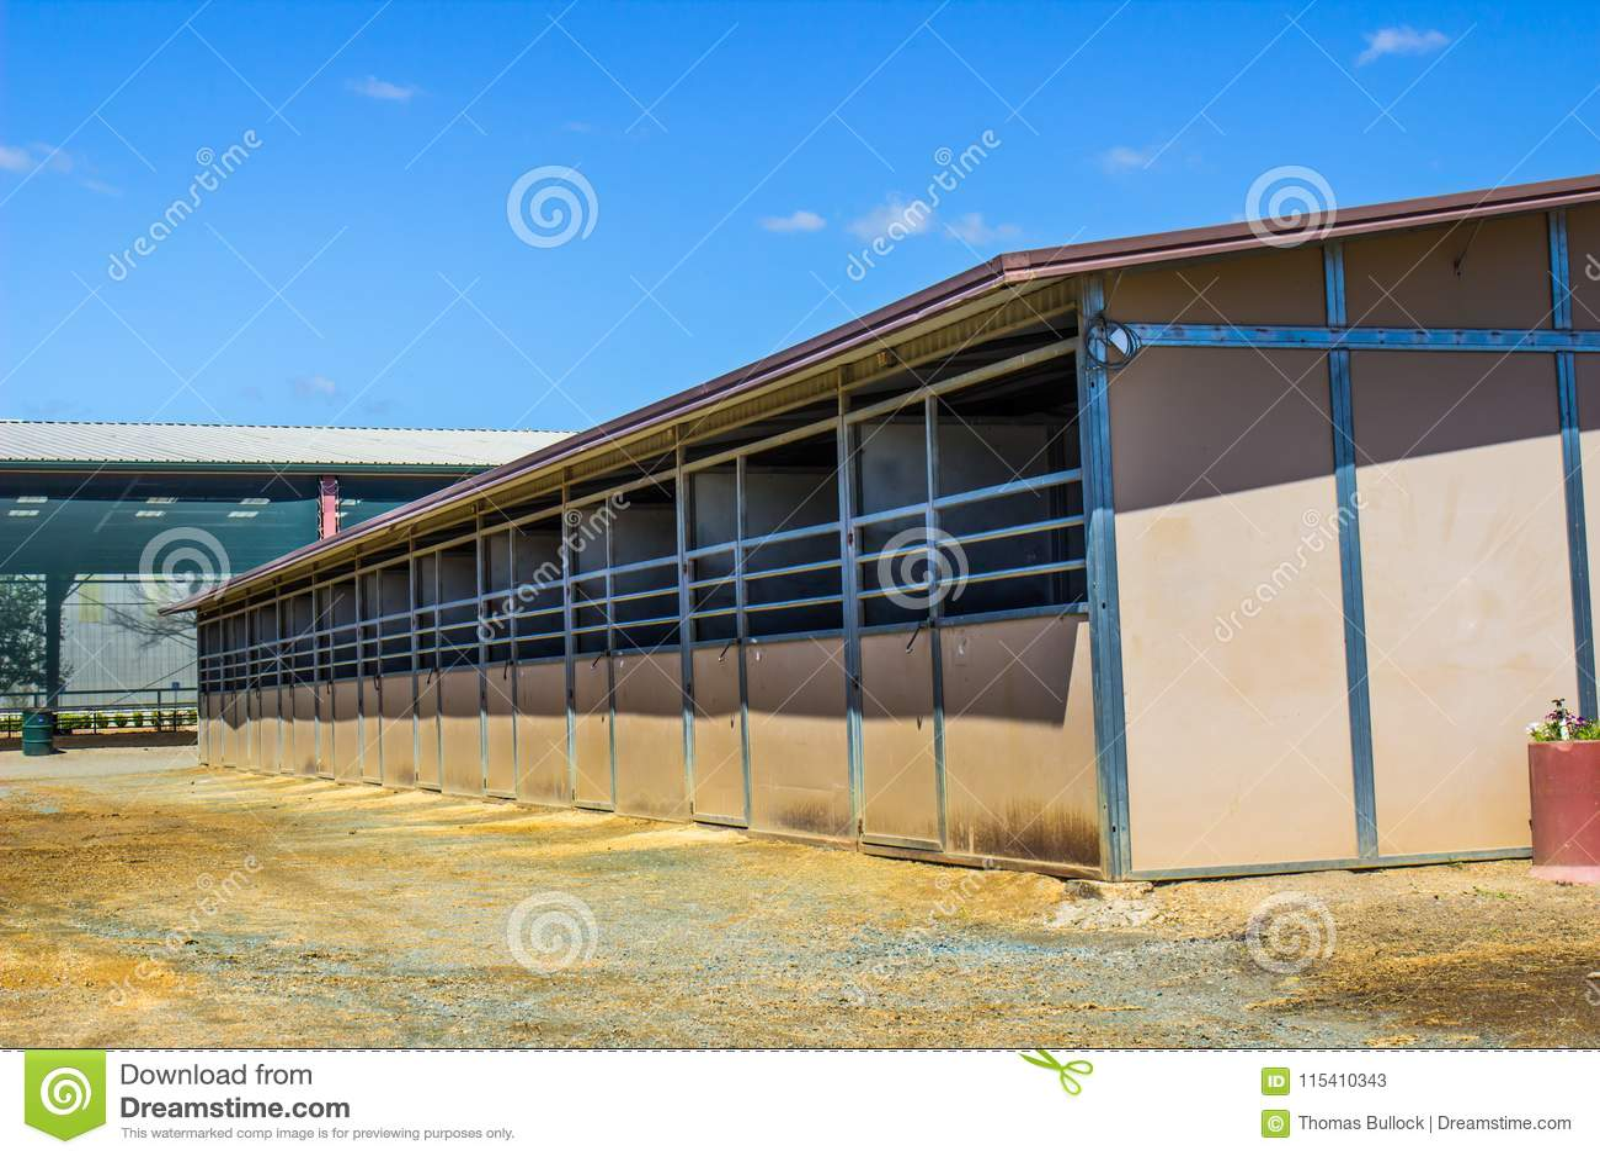 Horse Stalls Outside Equestrian Pavilion Stock Image Image Of Stalls Doors 115410343